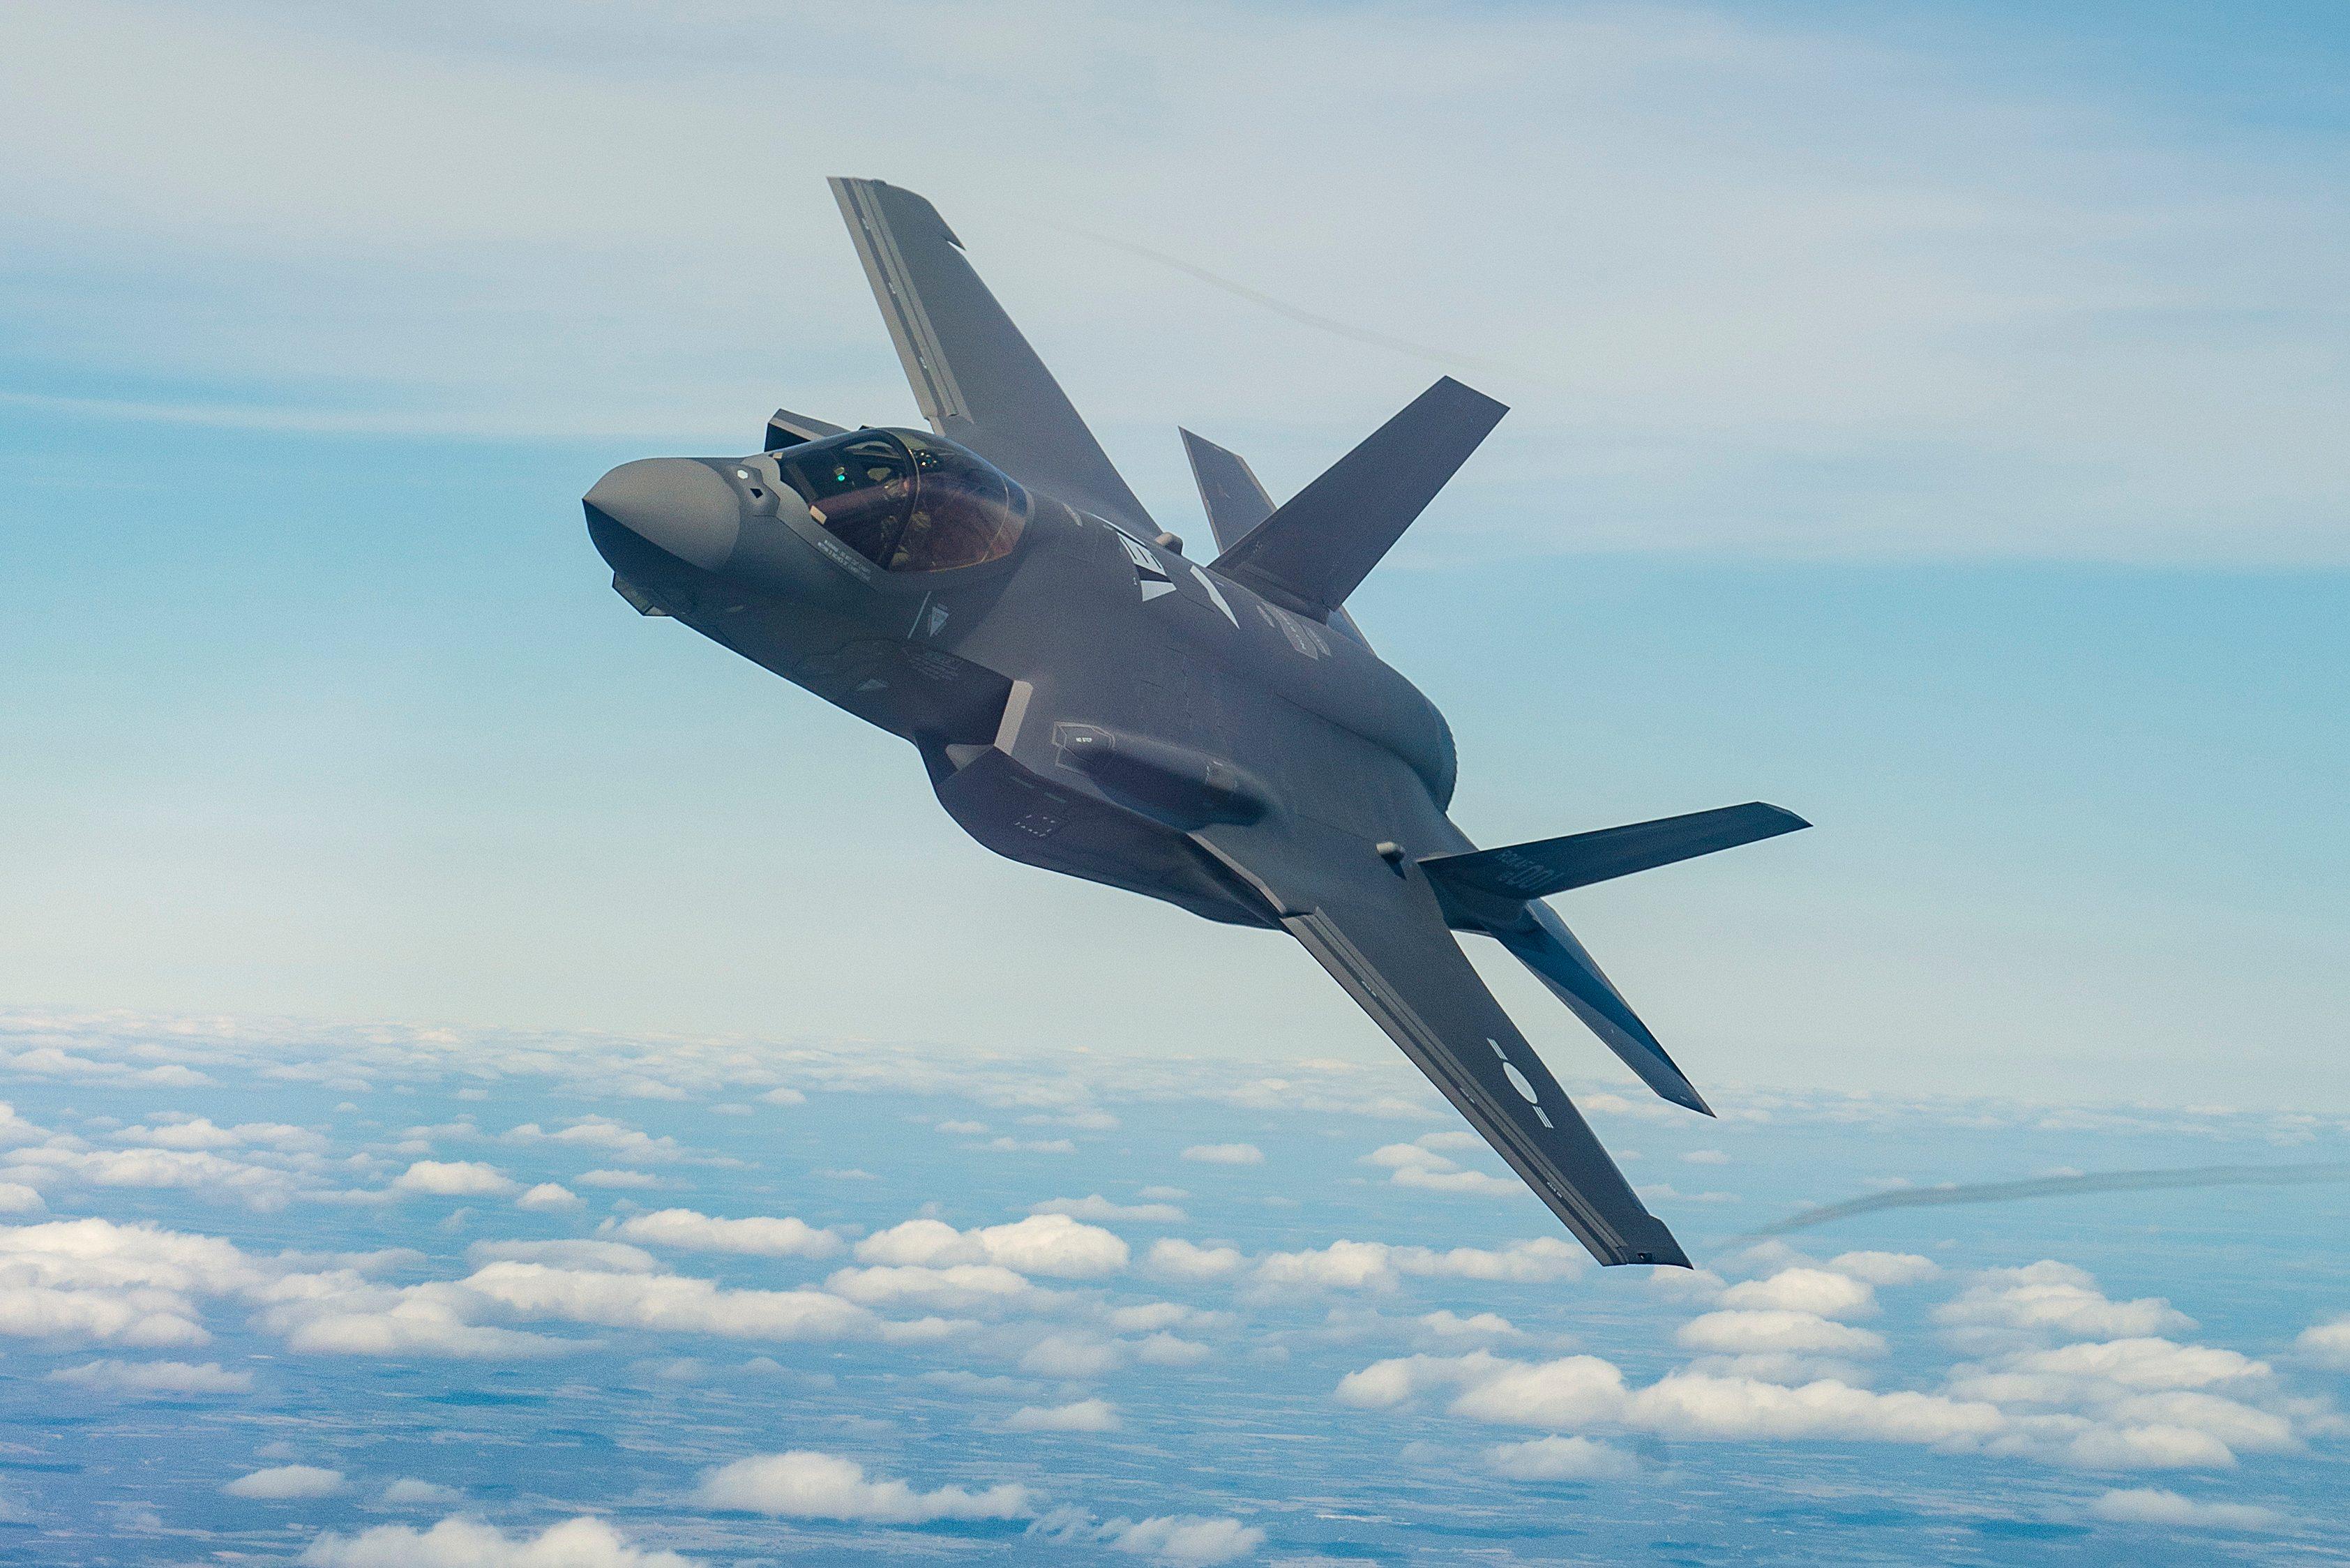 F-35A_AW1_FP18-02112-0056_PR.jpg.pc-adap